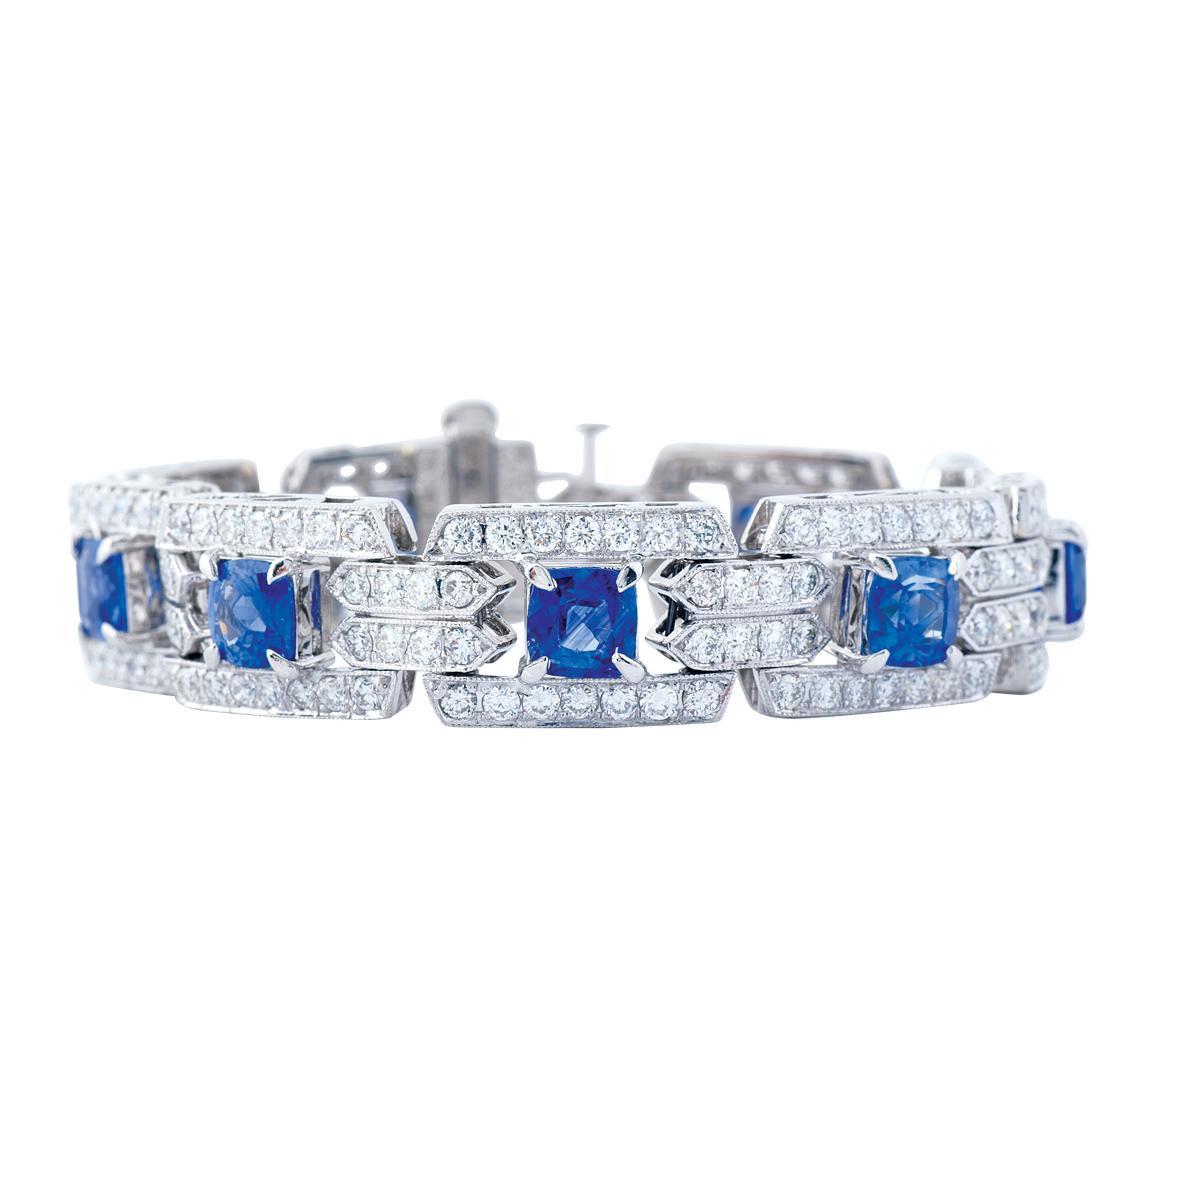 Vintage Platinum 16.12 CTW Diamond and Sapphire Bracelet